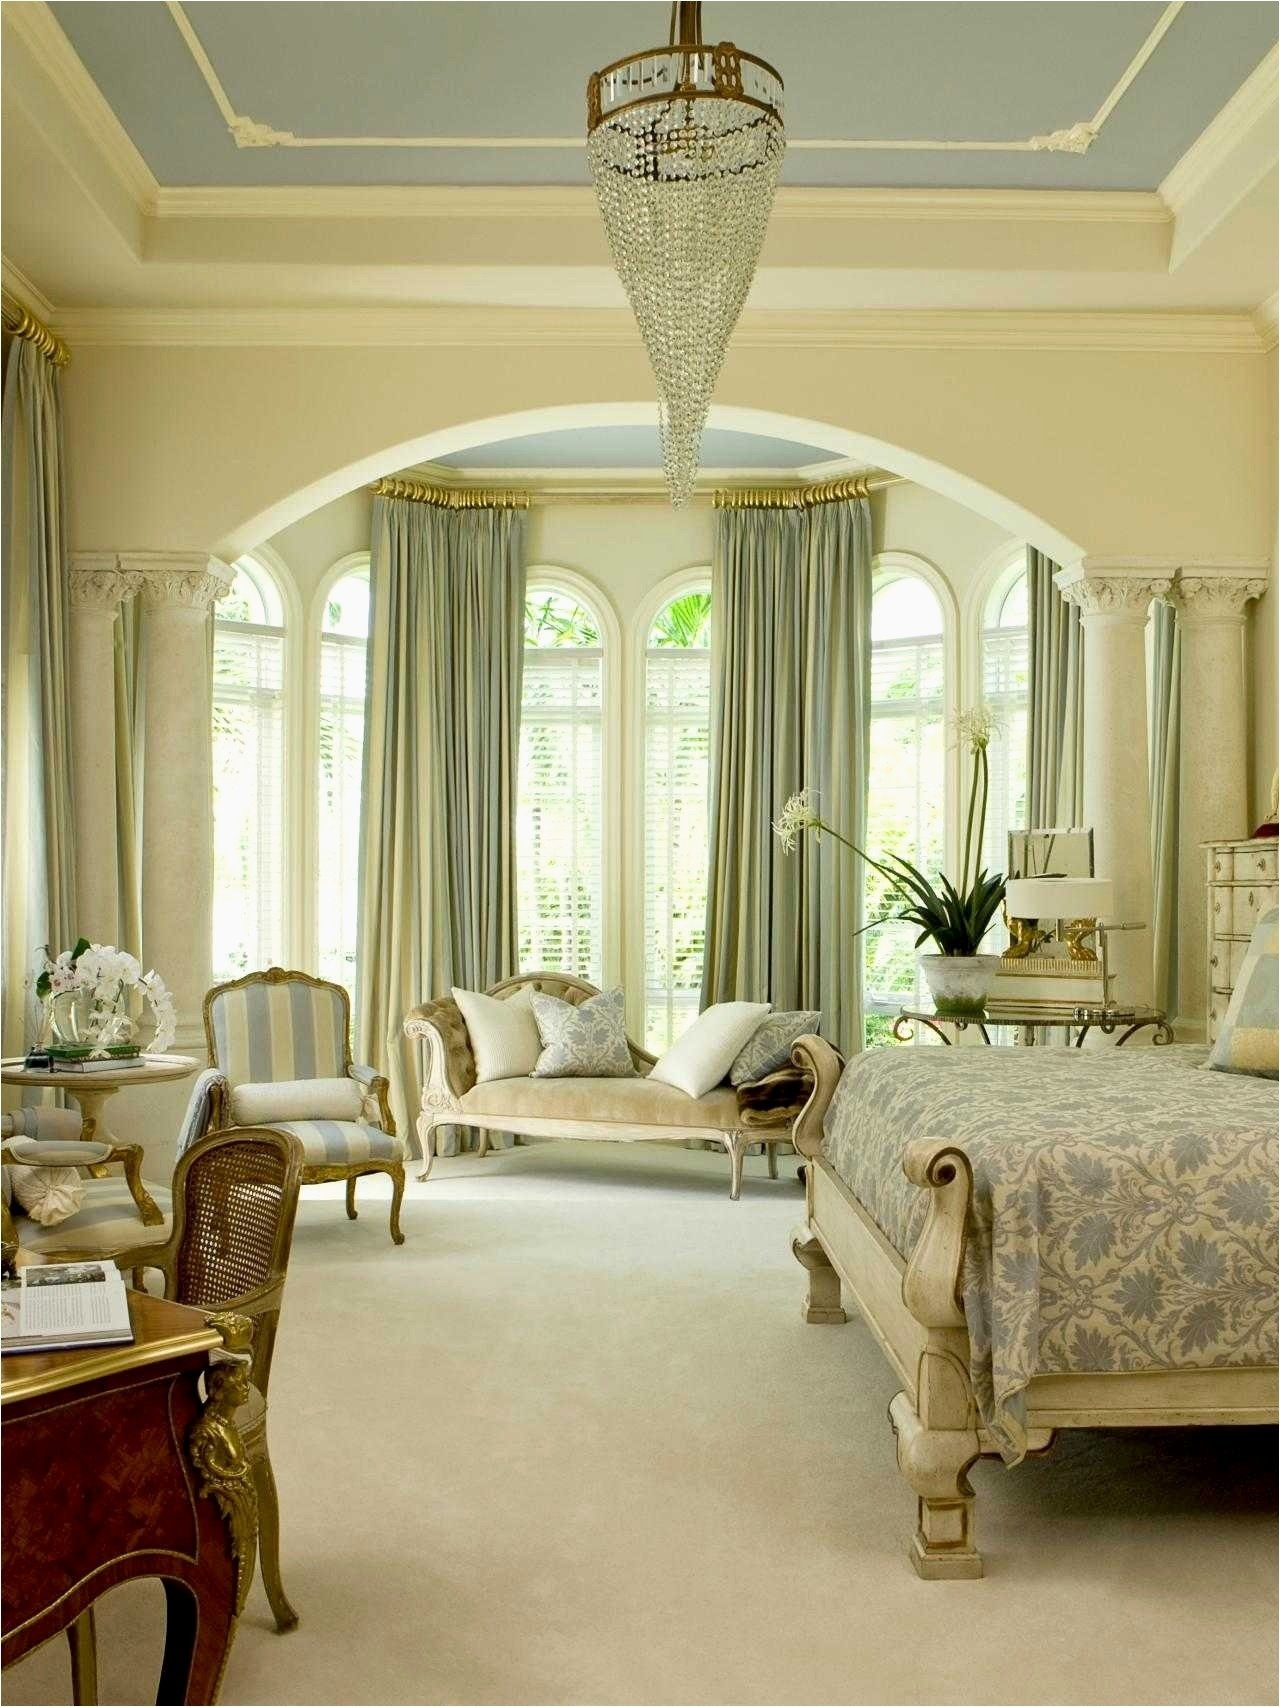 unique window treatment ideas for bedroom idea - best bedroom design